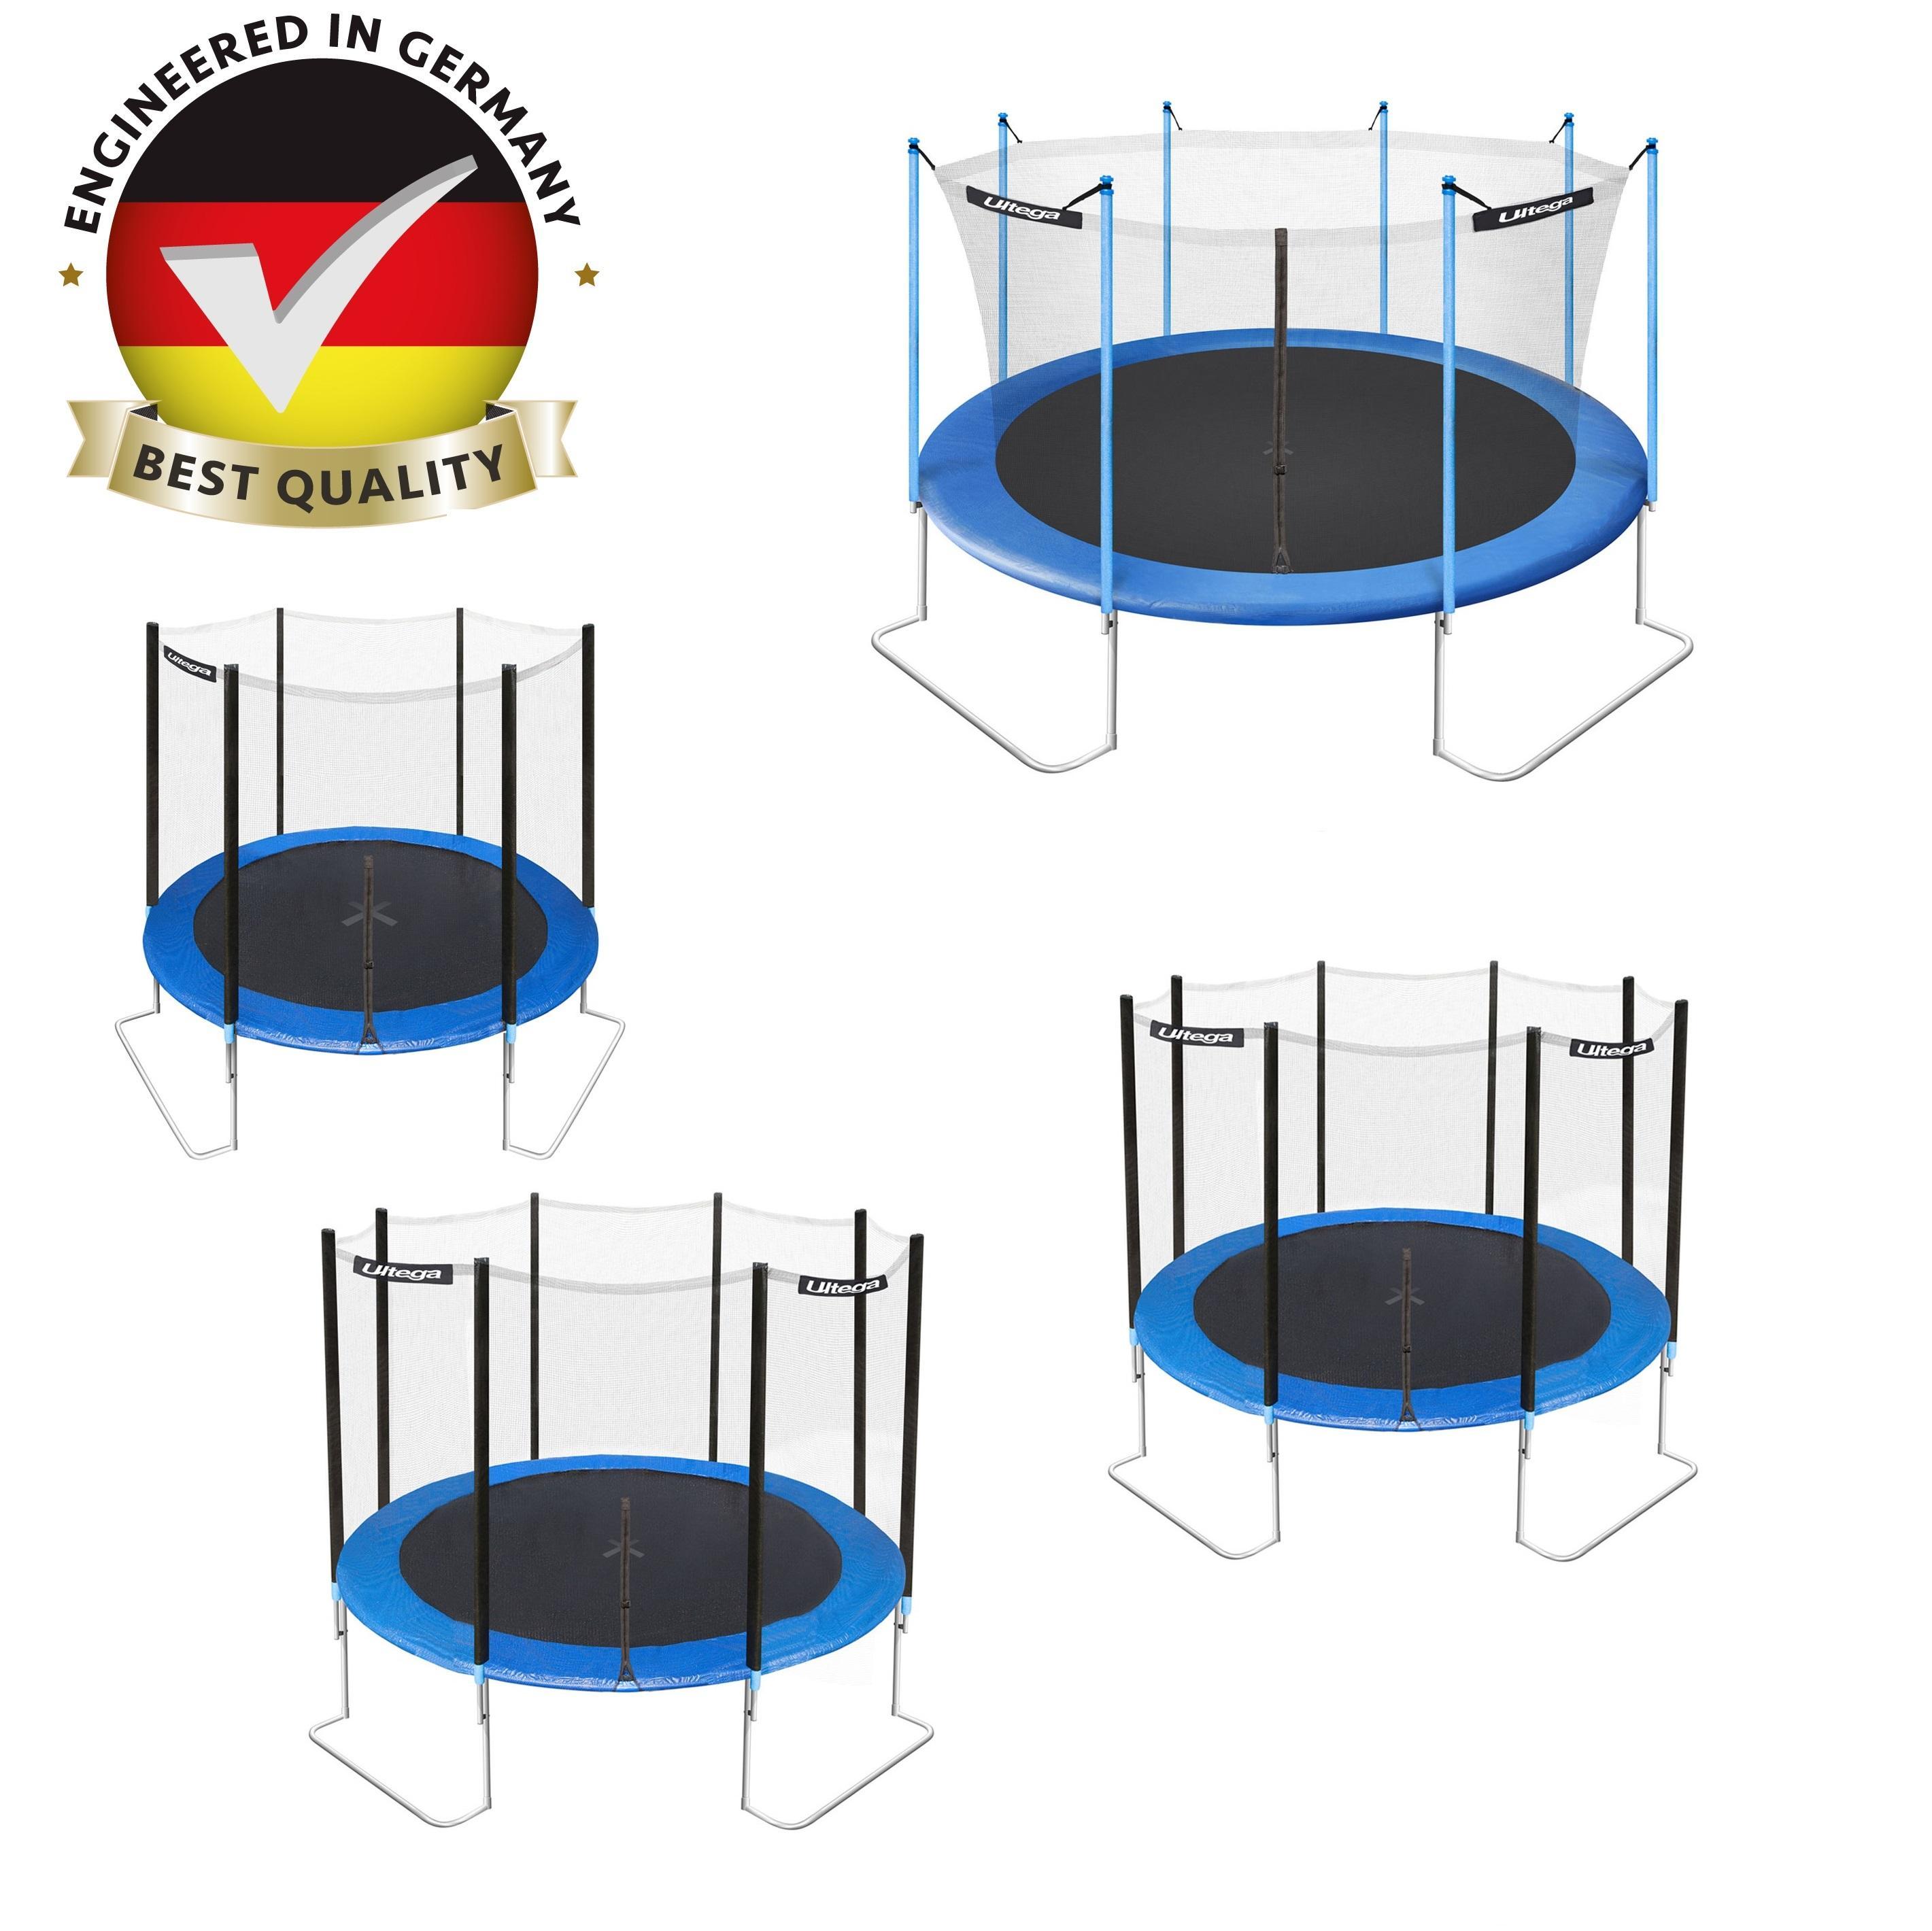 Amazon.com : Ultega Jumper Trampoline With Safety Net, 14